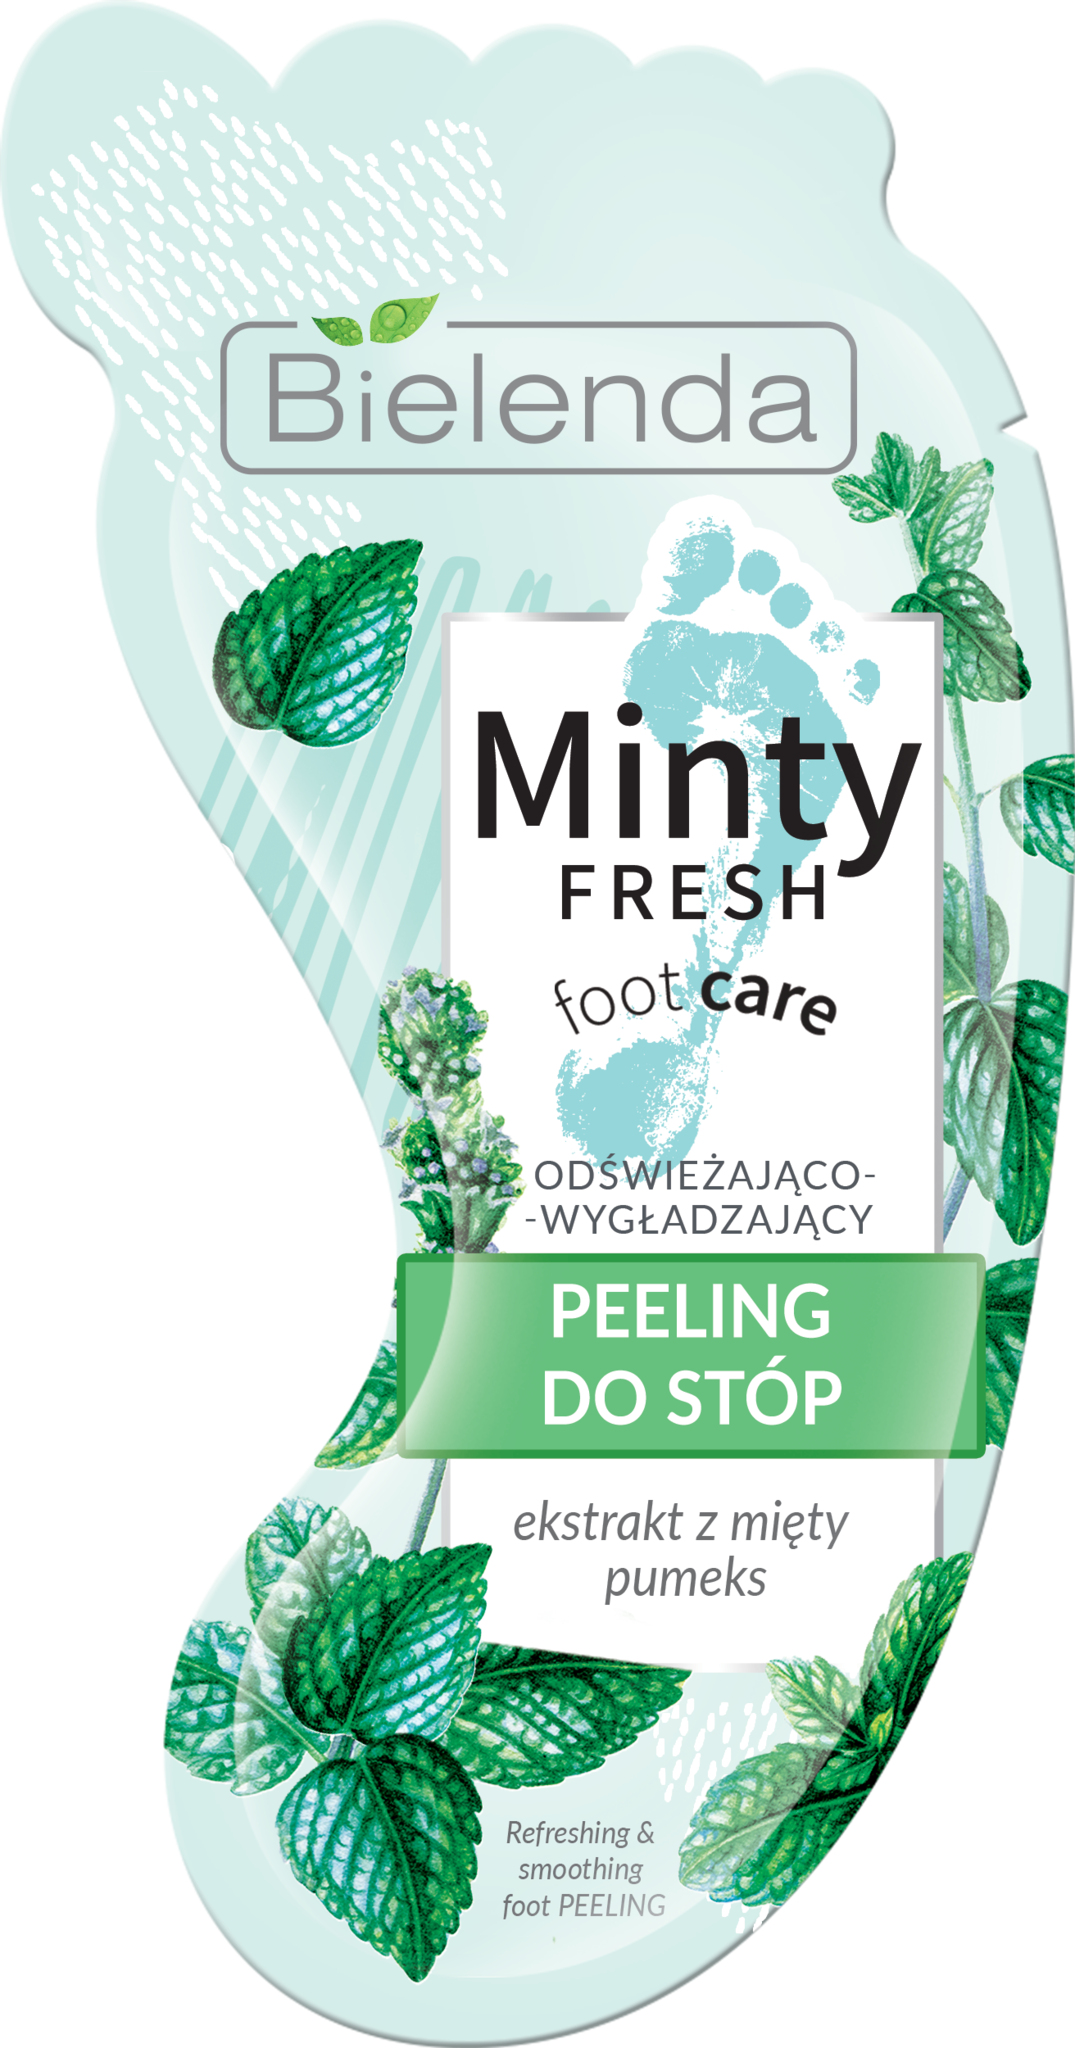 MINTY FRESH FOOT CARE освежающий разглаживающий скраб для ног 10 г (*12)шт32432487,9